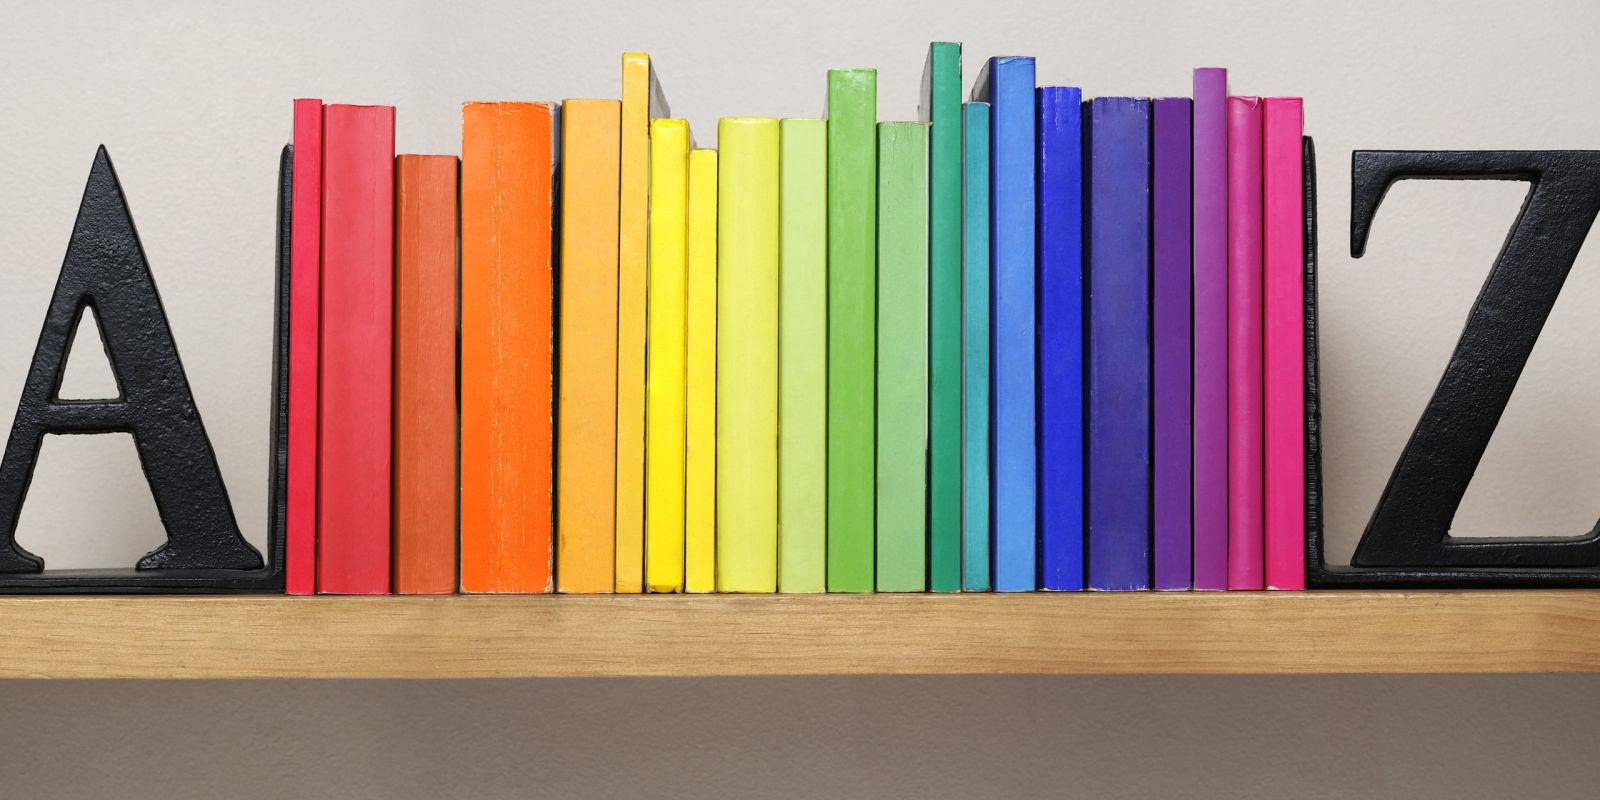 Co colour coordinated bookshelf - Co Colour Coordinated Bookshelf 59